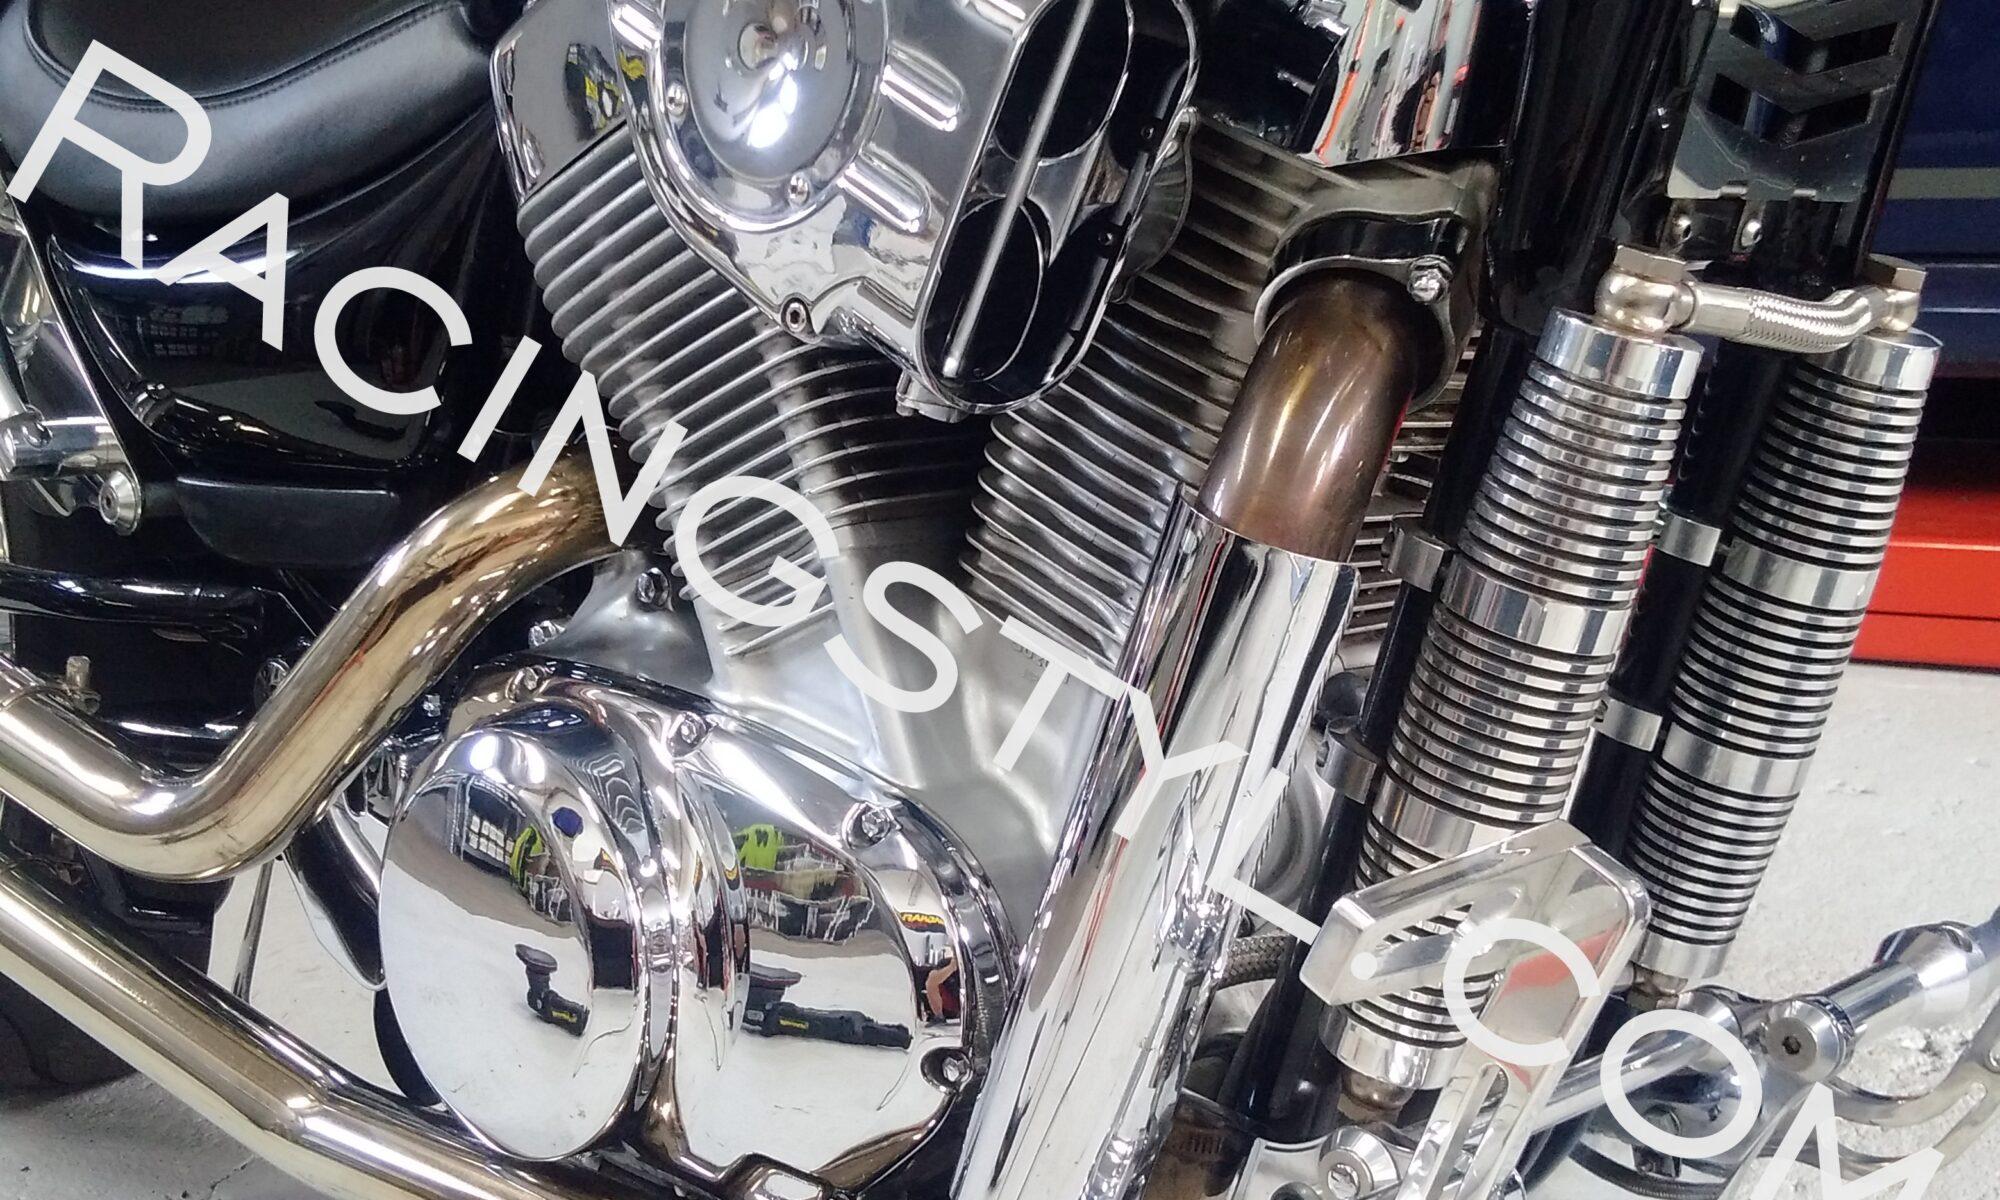 Detailing motorka